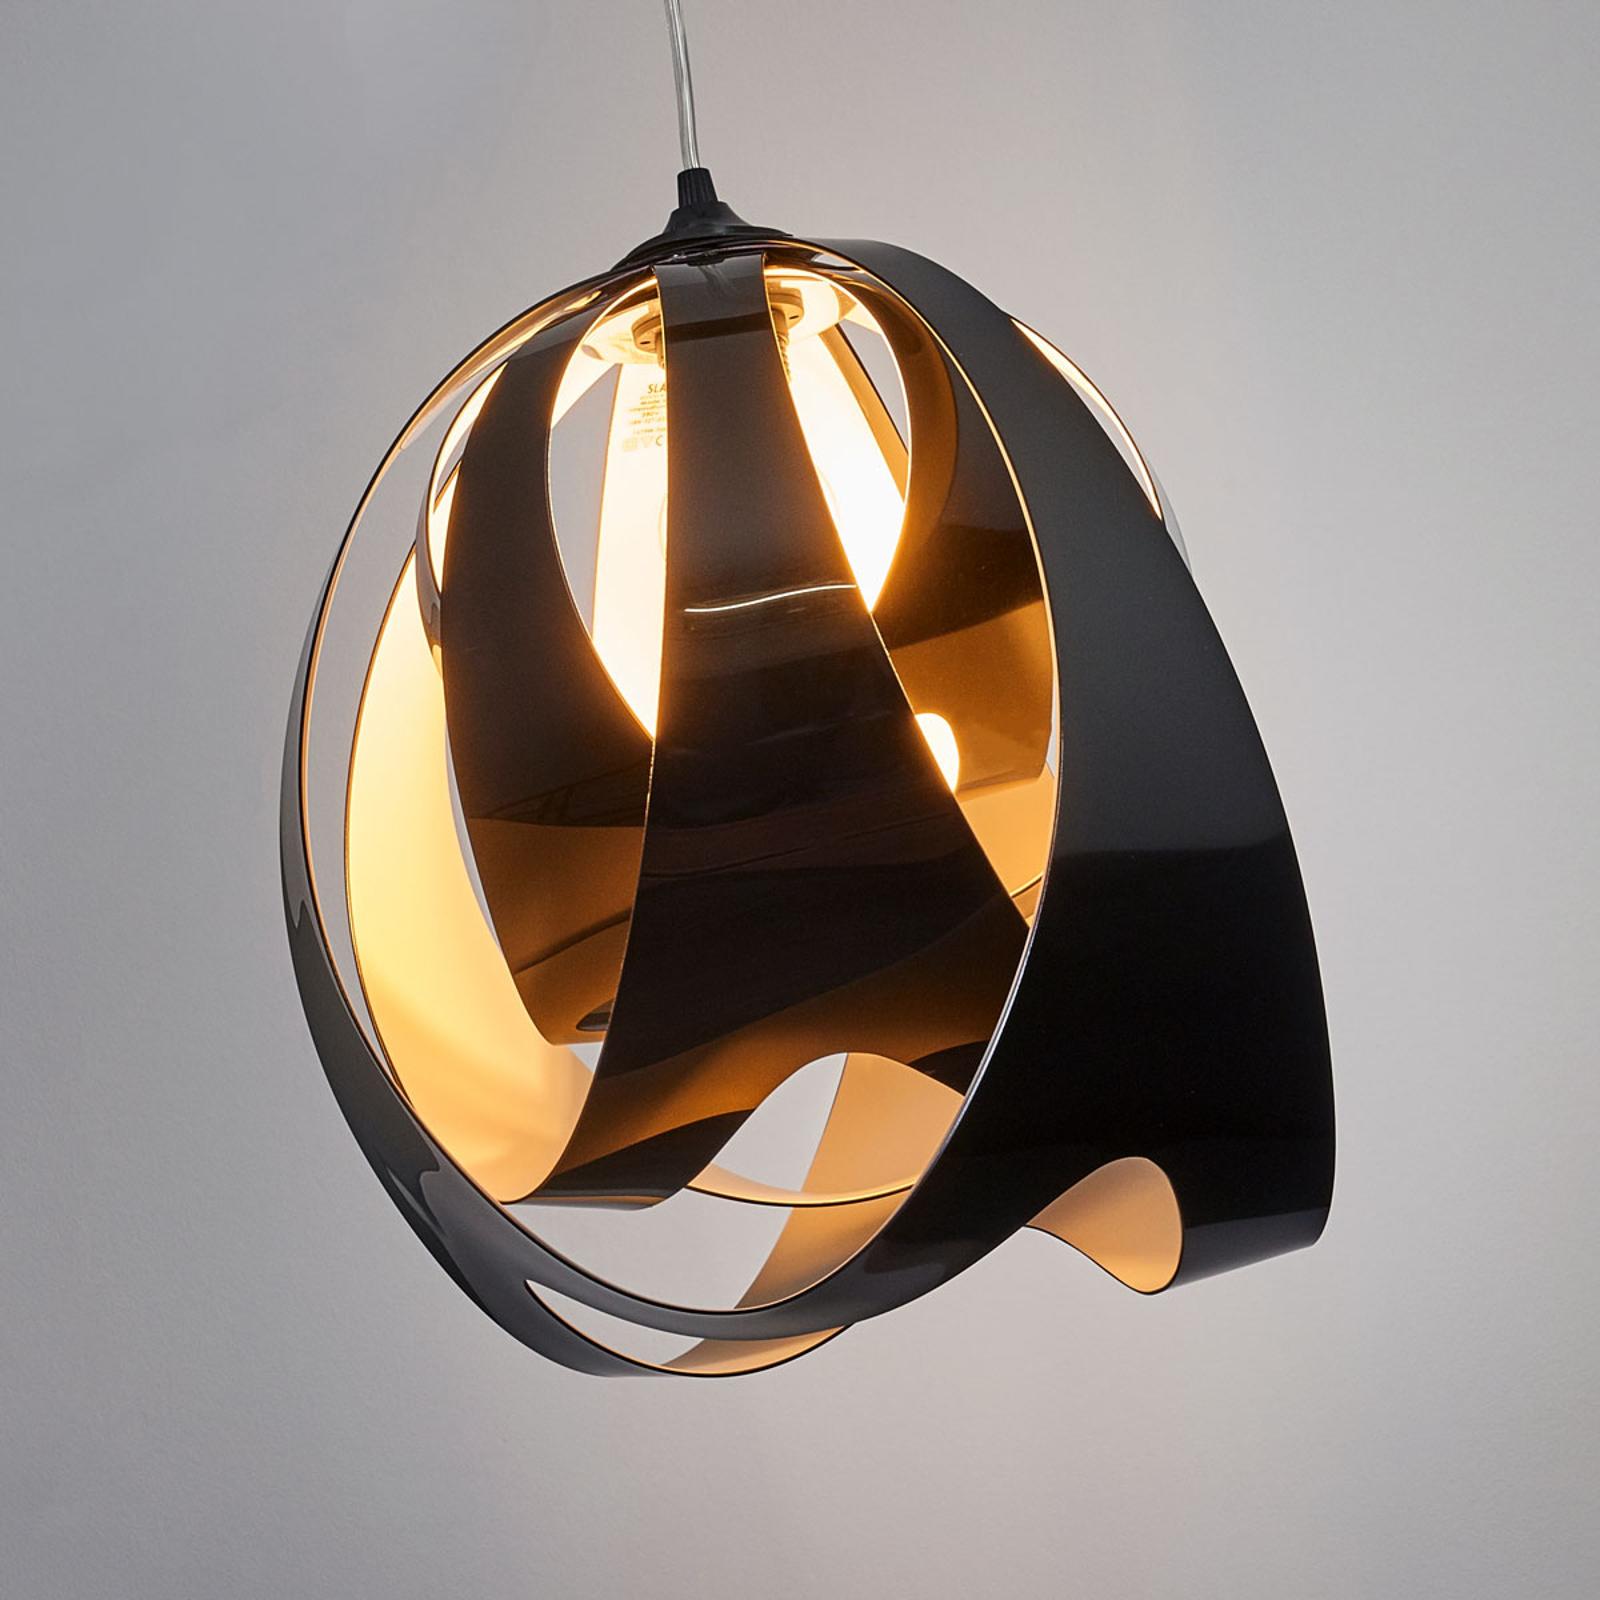 Slamp Goccia di Luce - suspension noire